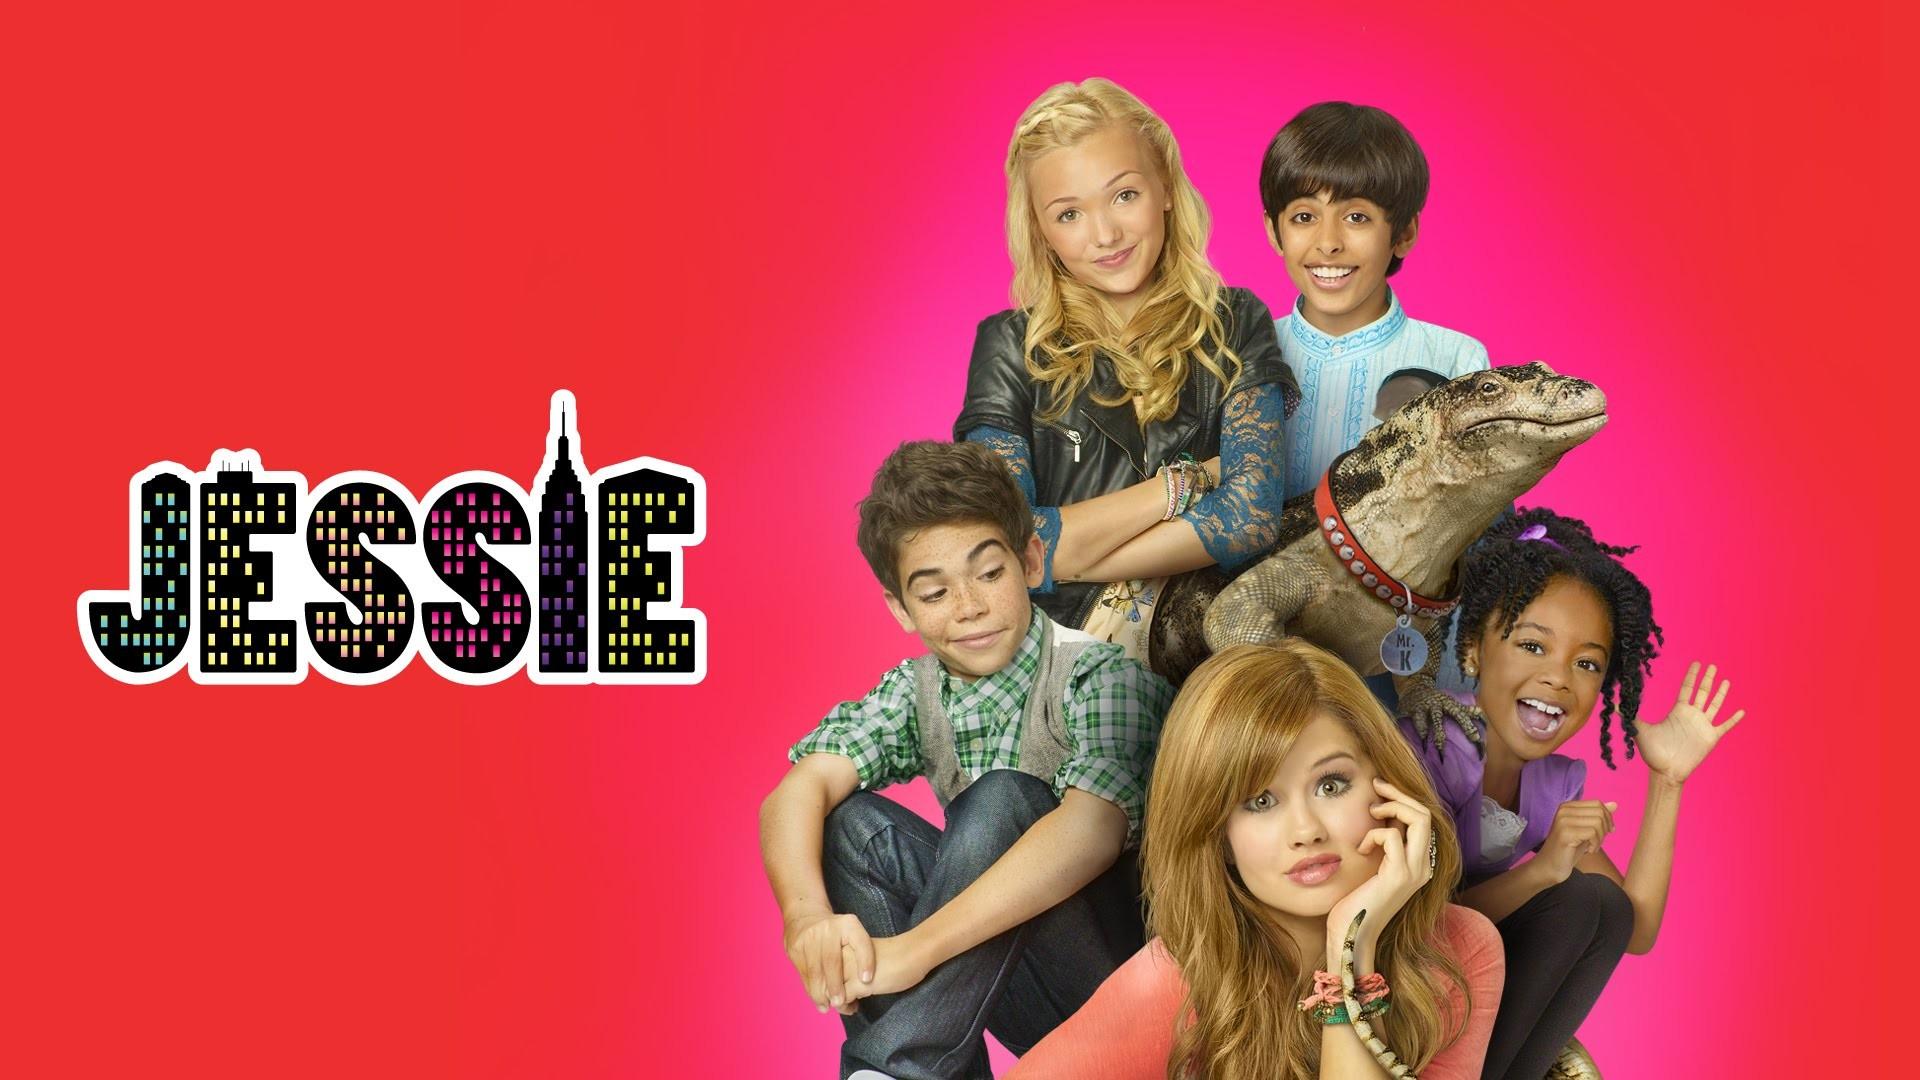 Jessie Wallpaper Disney Channel 62 Images